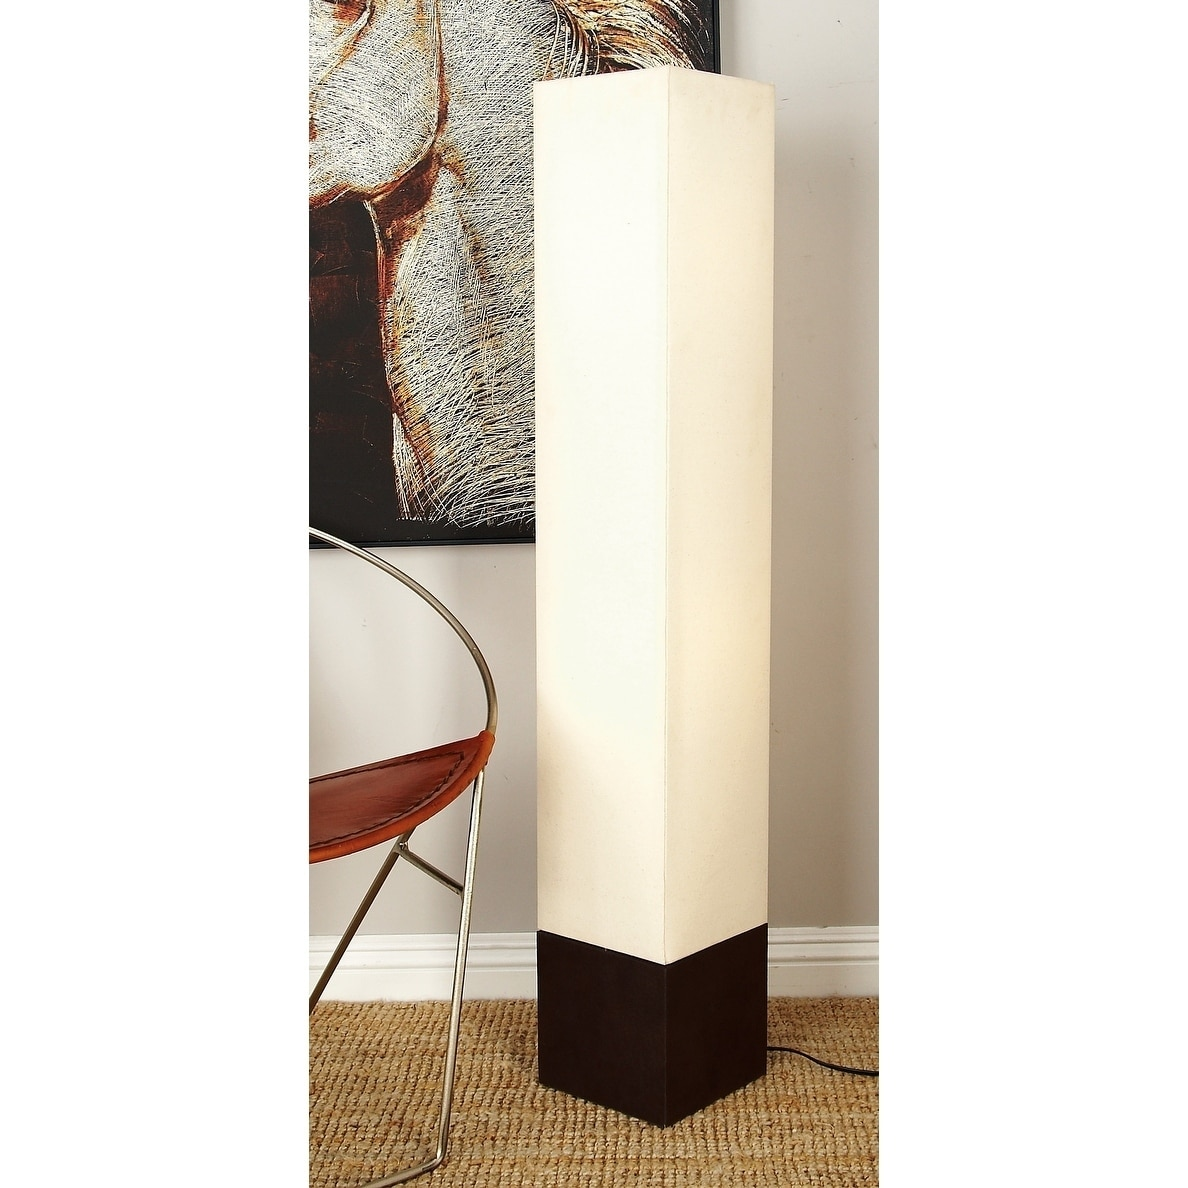 Ivory Wooden Tower Uplight Floor Lamp